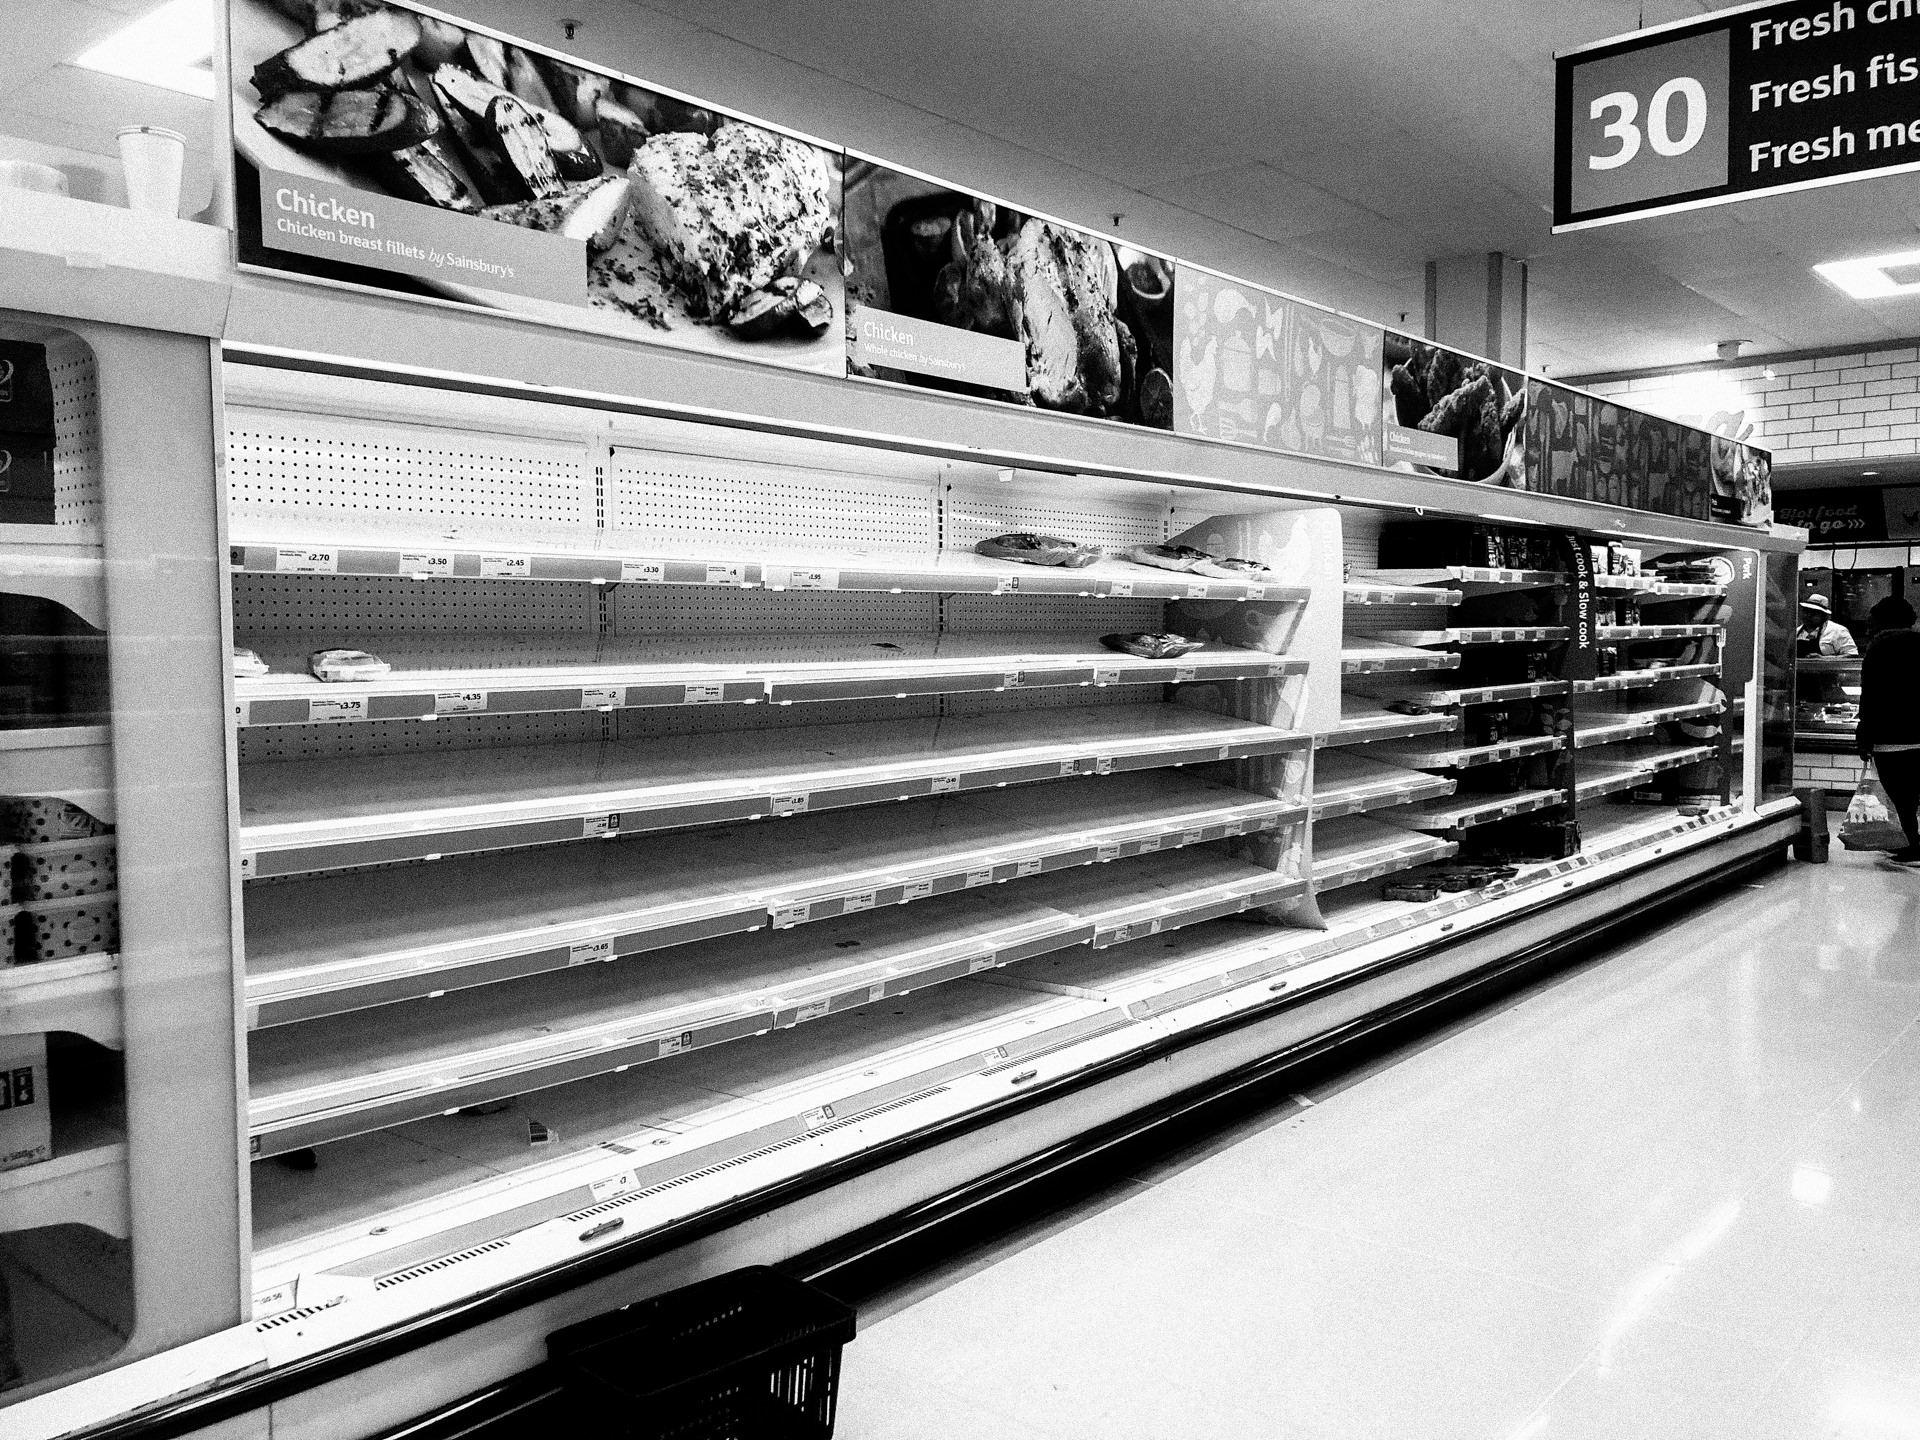 sainsburys empty shelves dalston london during the corona virus